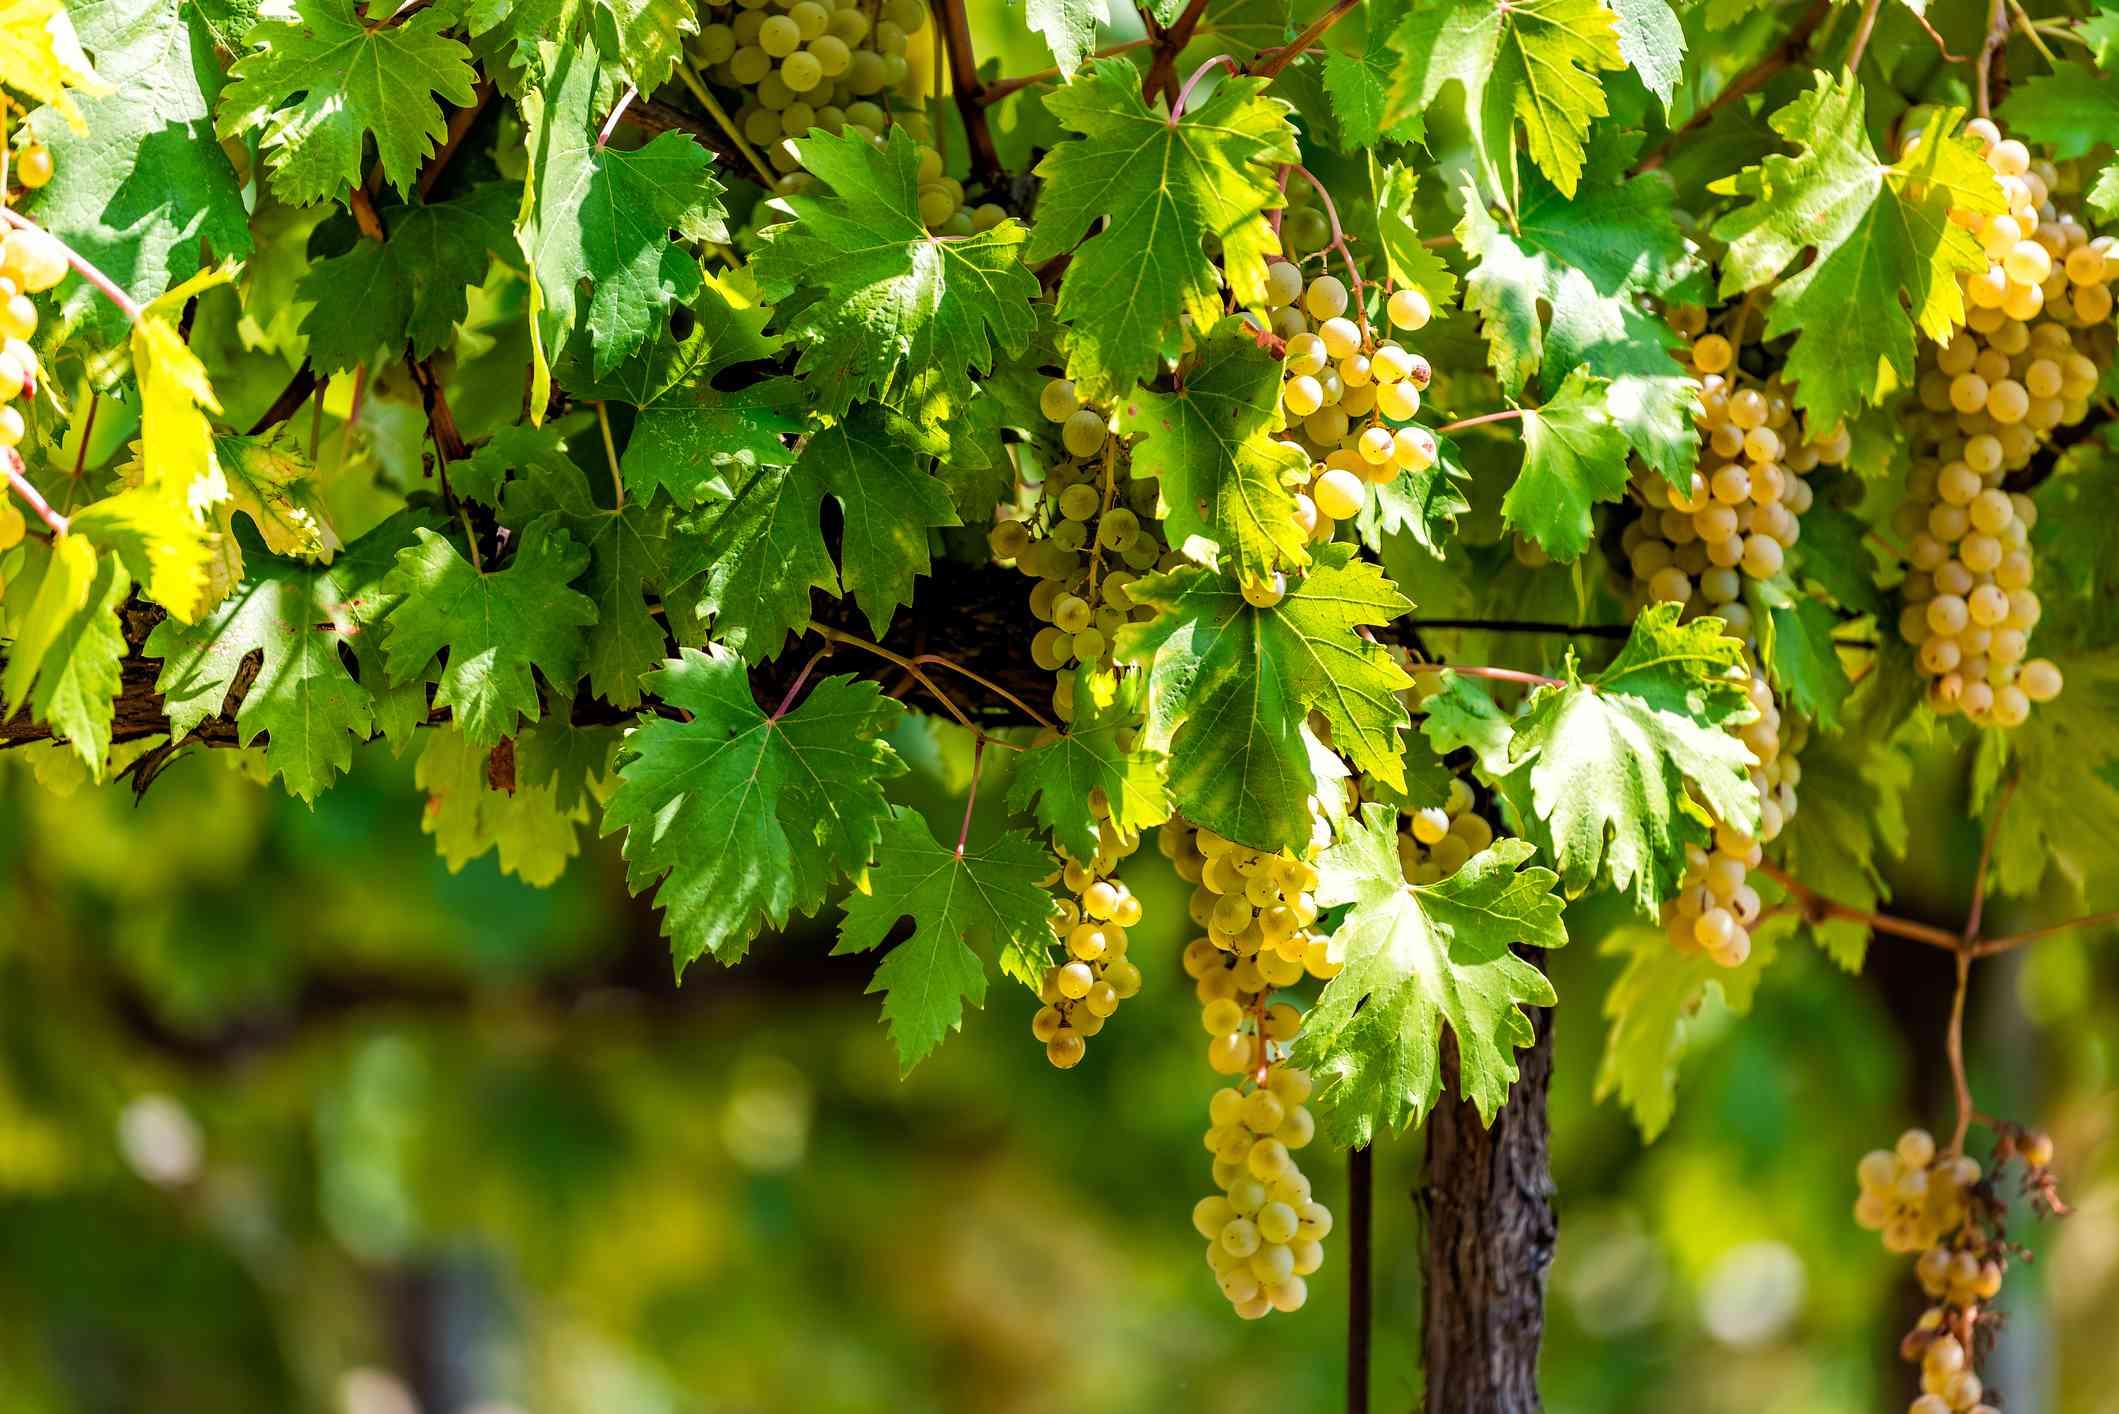 Grechetto grapes near Assisi, Umbria